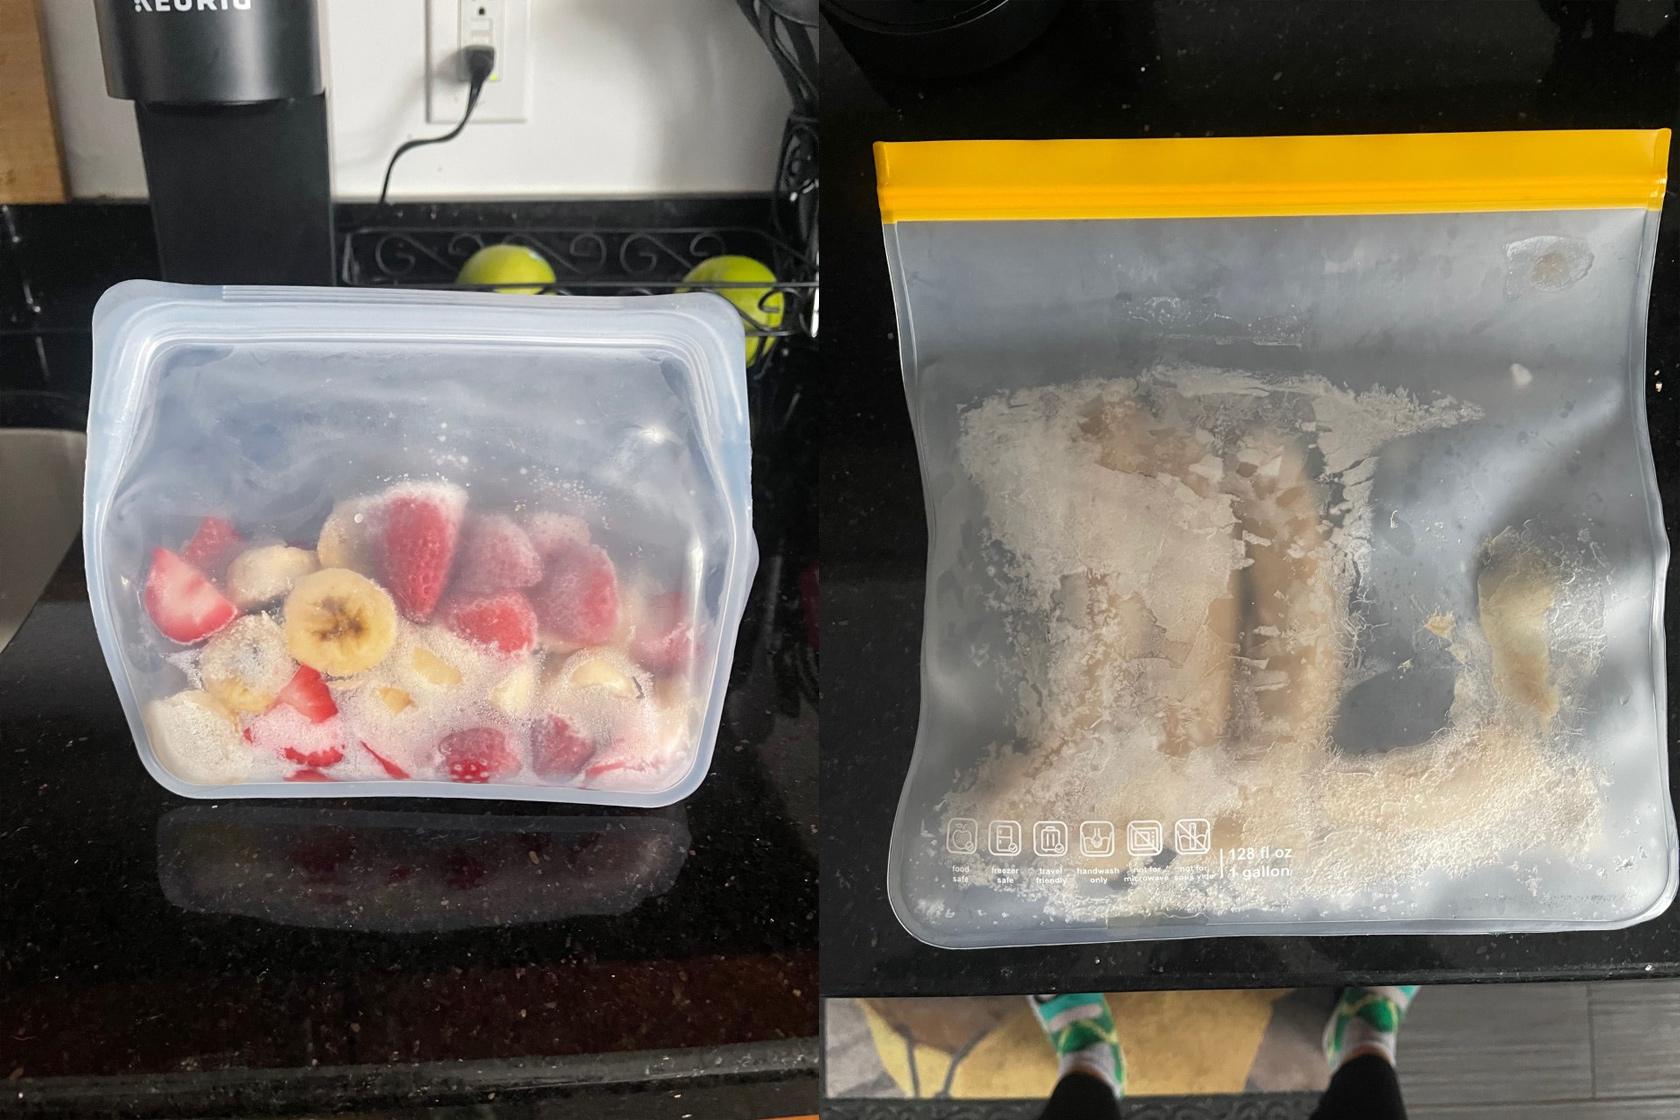 Strawberries & bananas in a Stasher bag vs. bananas in a budget-friendly reusable bag